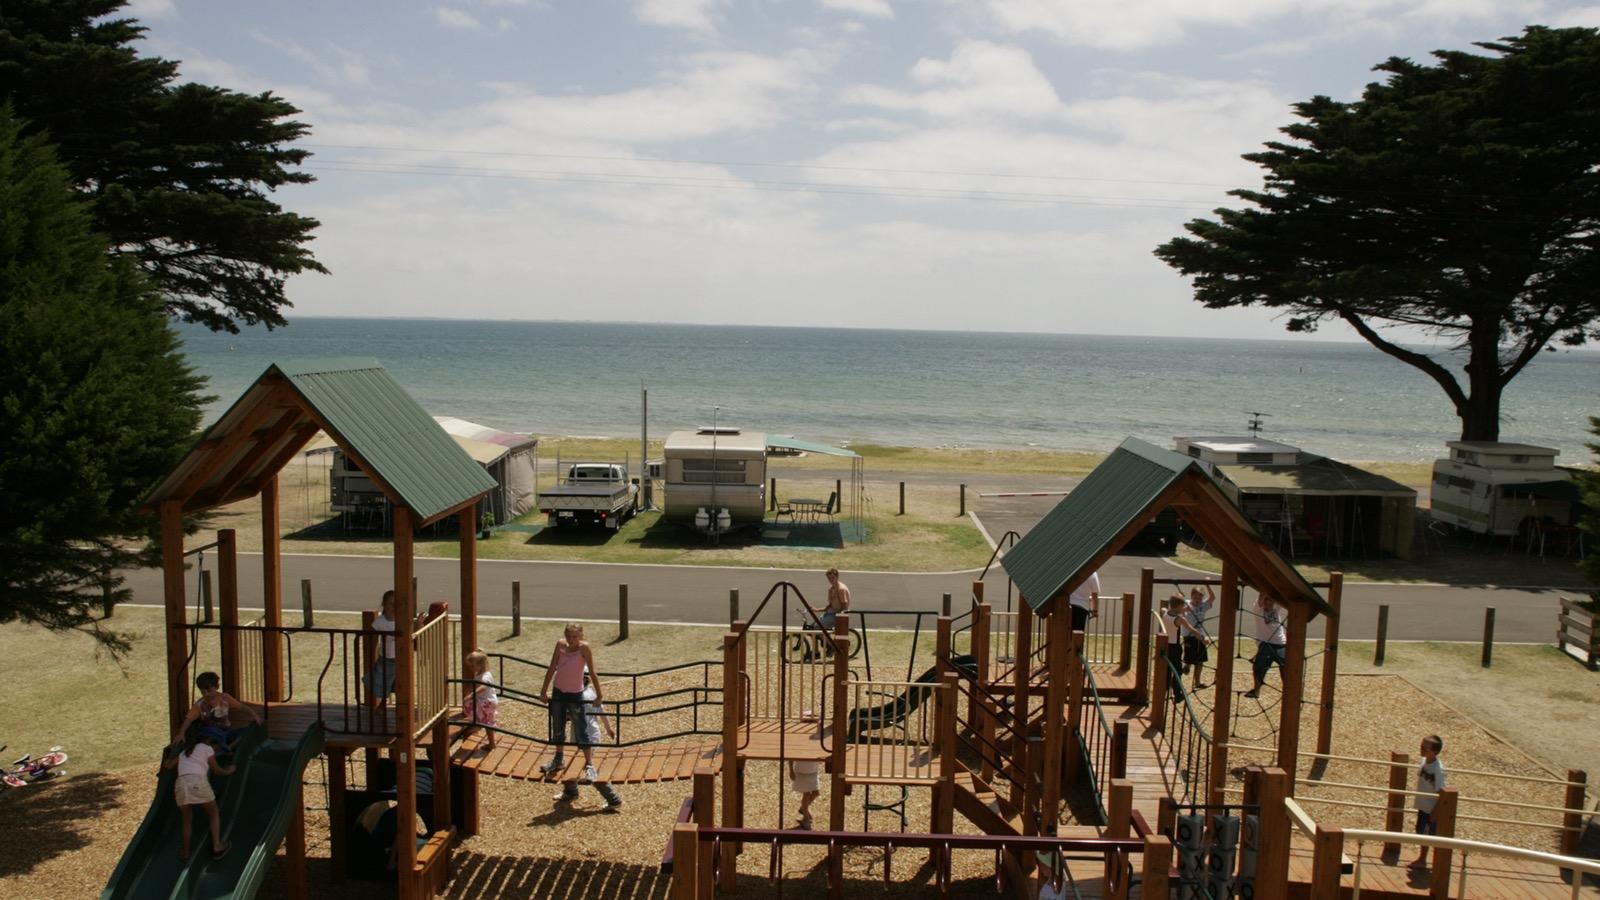 Kids Playground at Portarlington Holiday Park